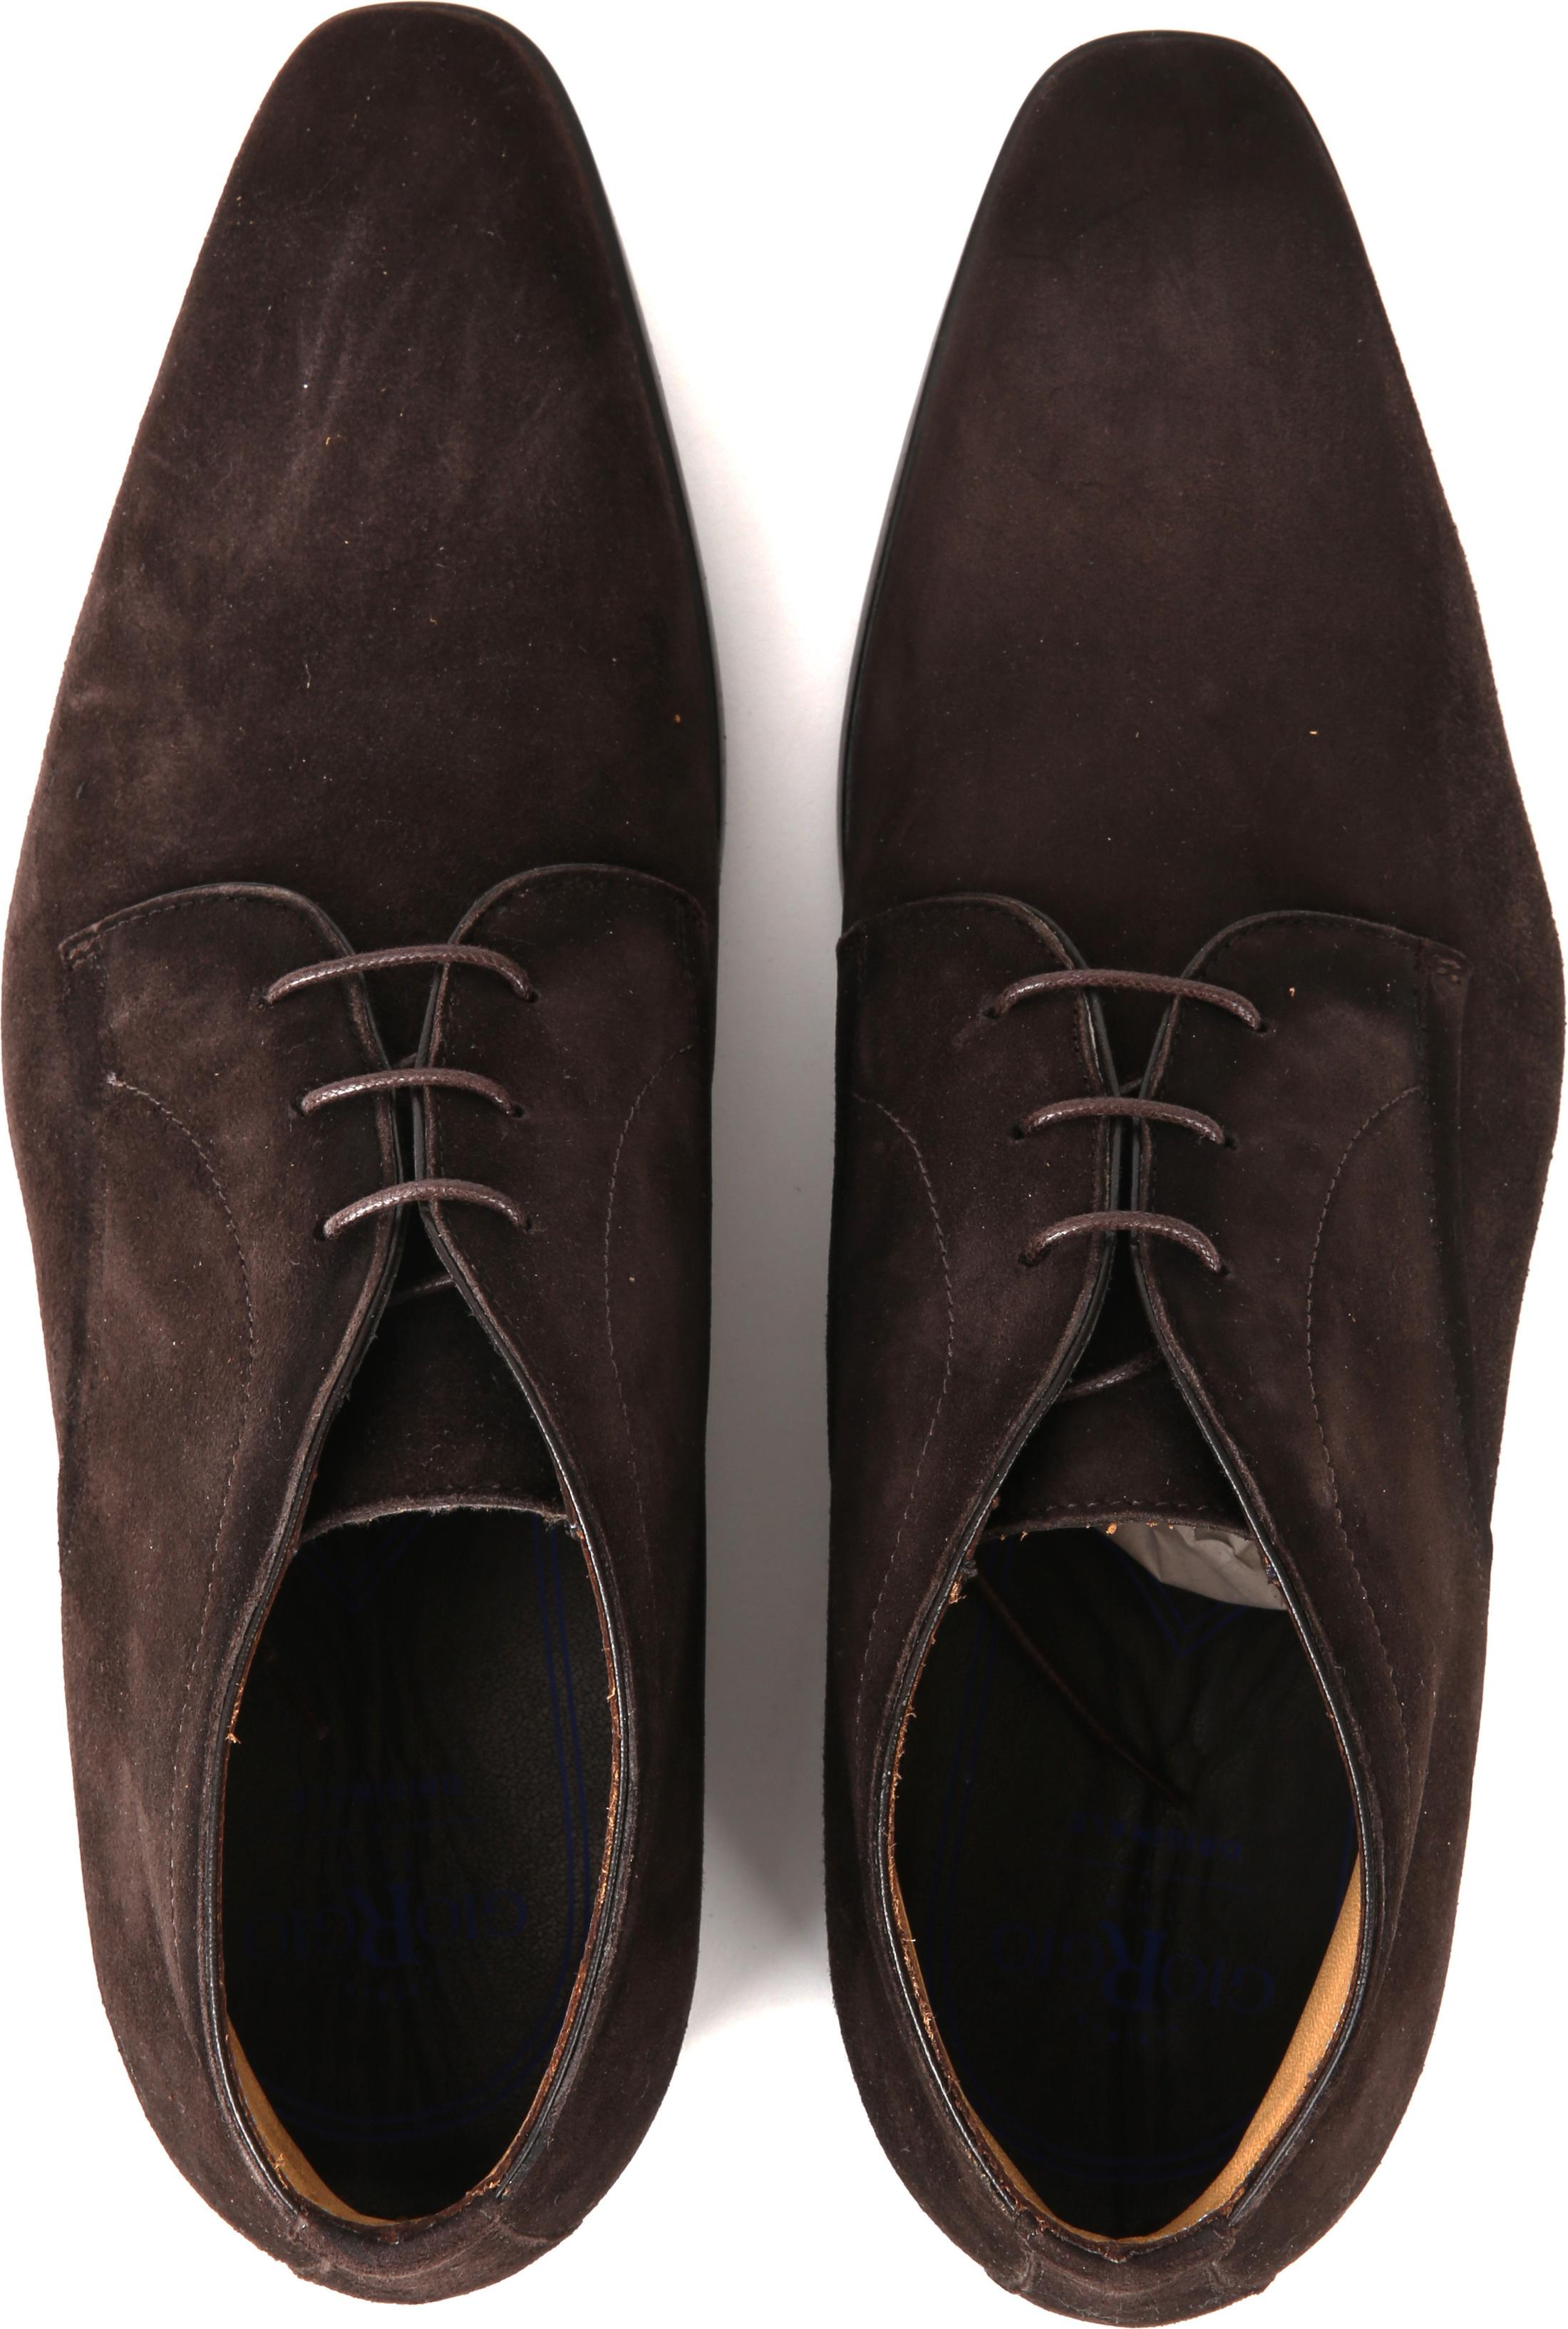 Giorgio Amalfi Shoe Suede Brown foto 4